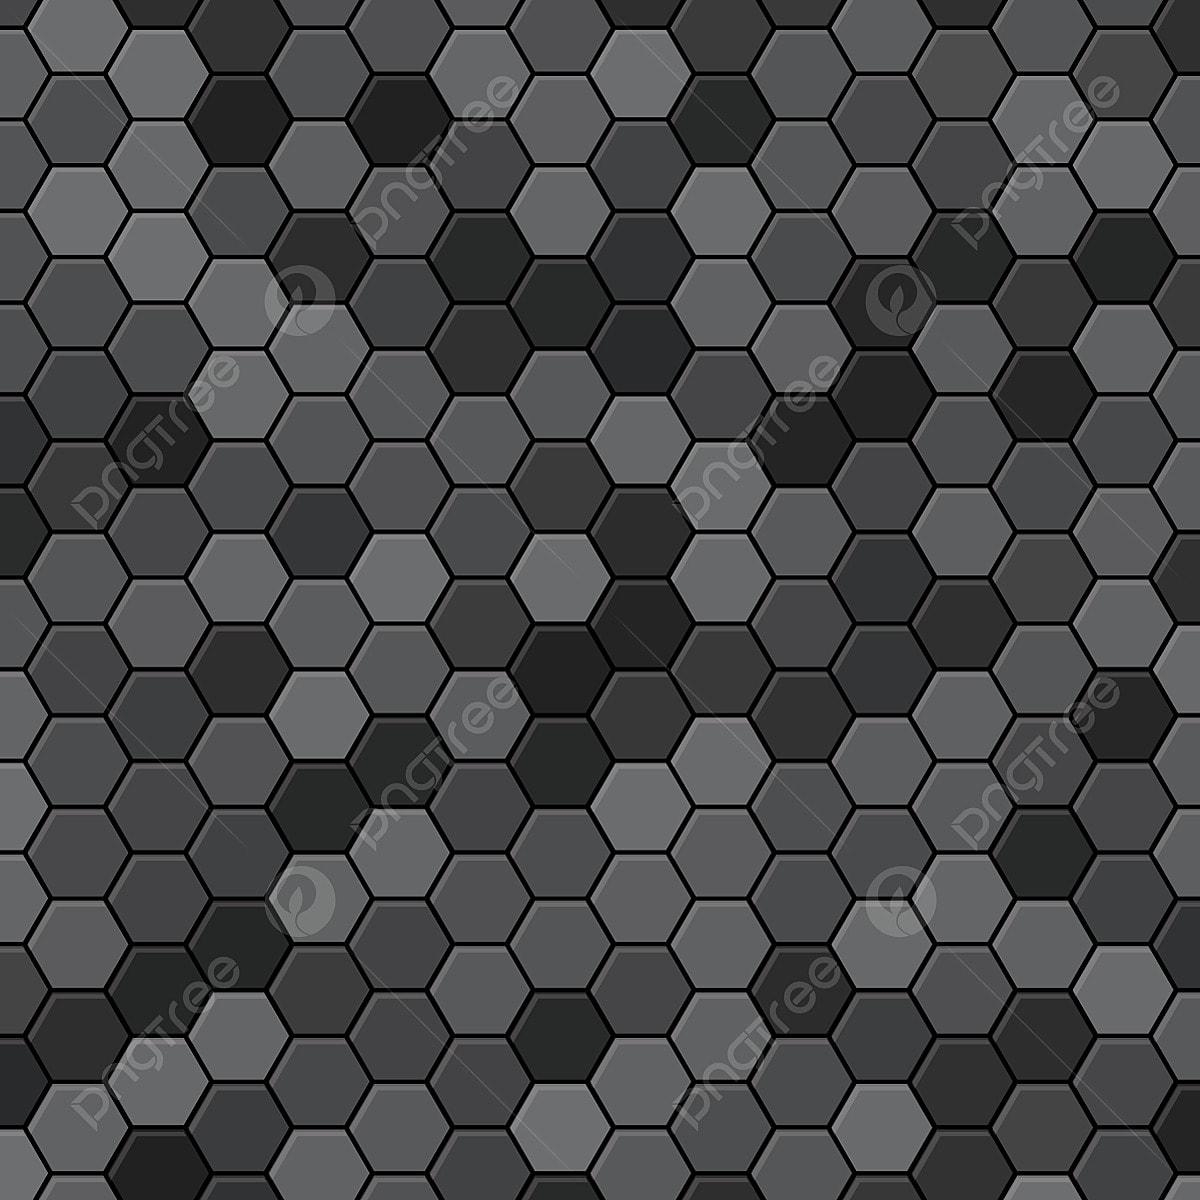 Abstract Hexagon Black Background Hexagon Texture Effect 3d